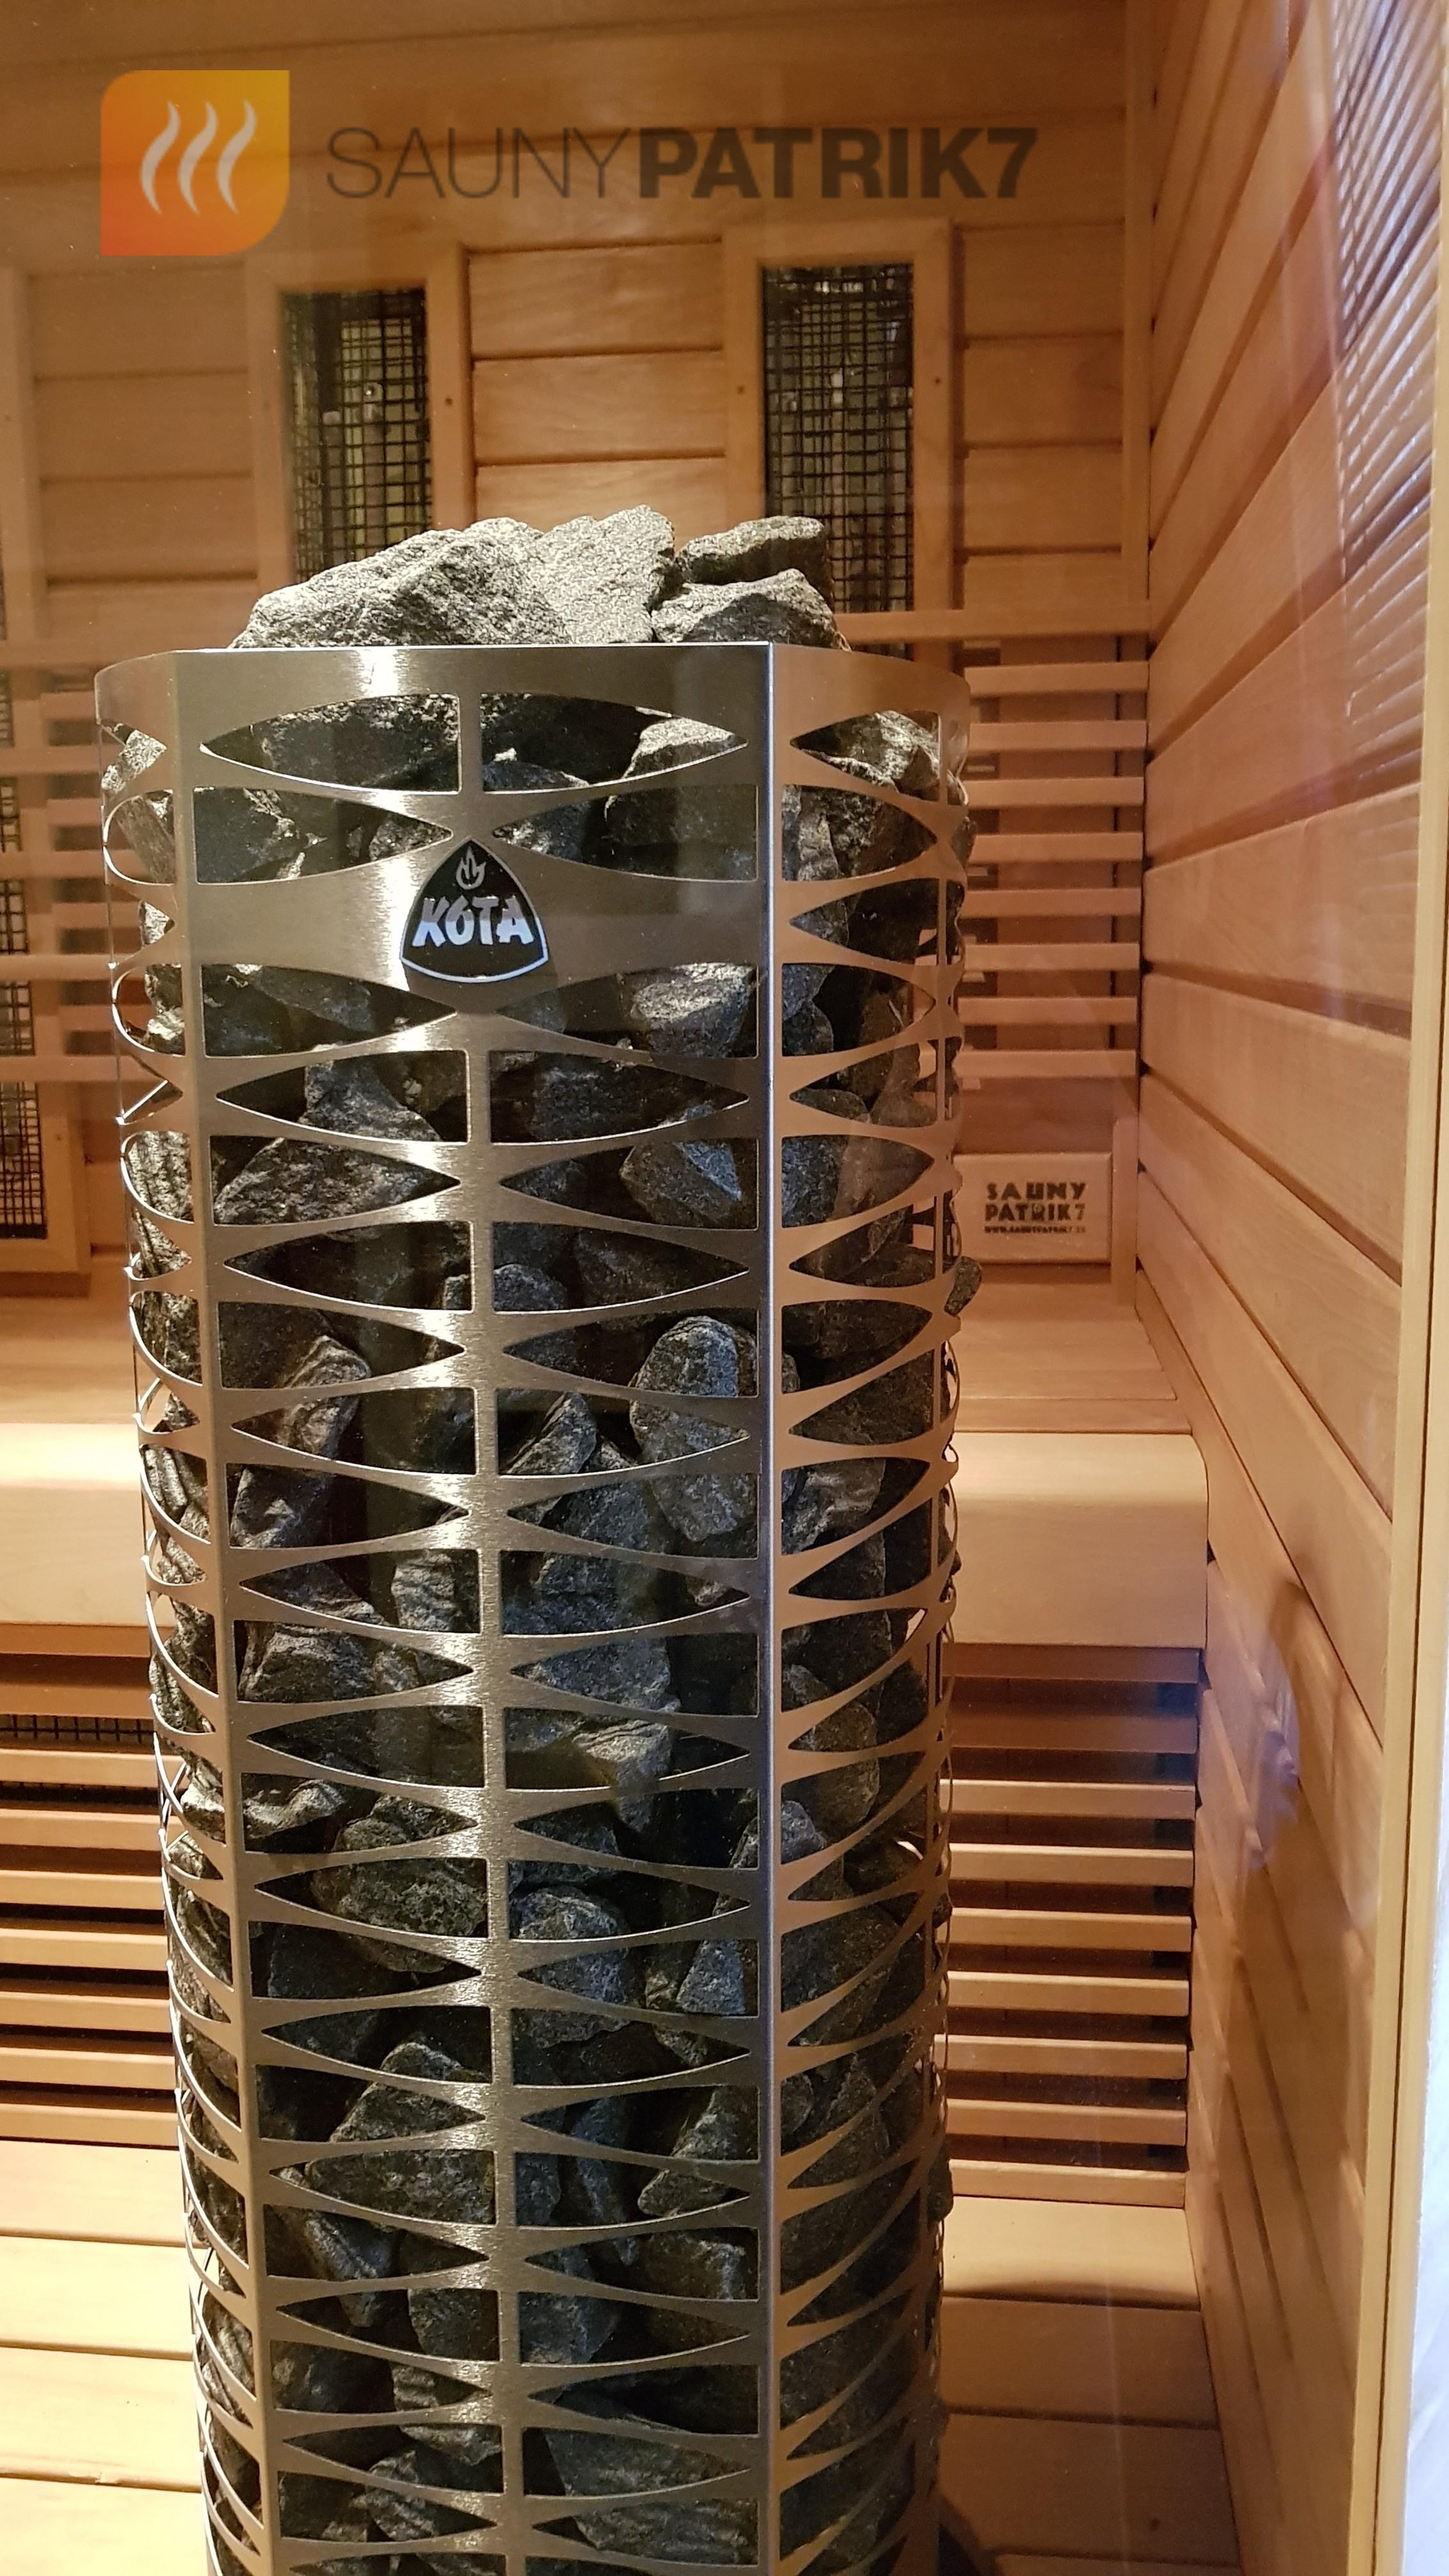 pec do sauny - sauny patrik 7